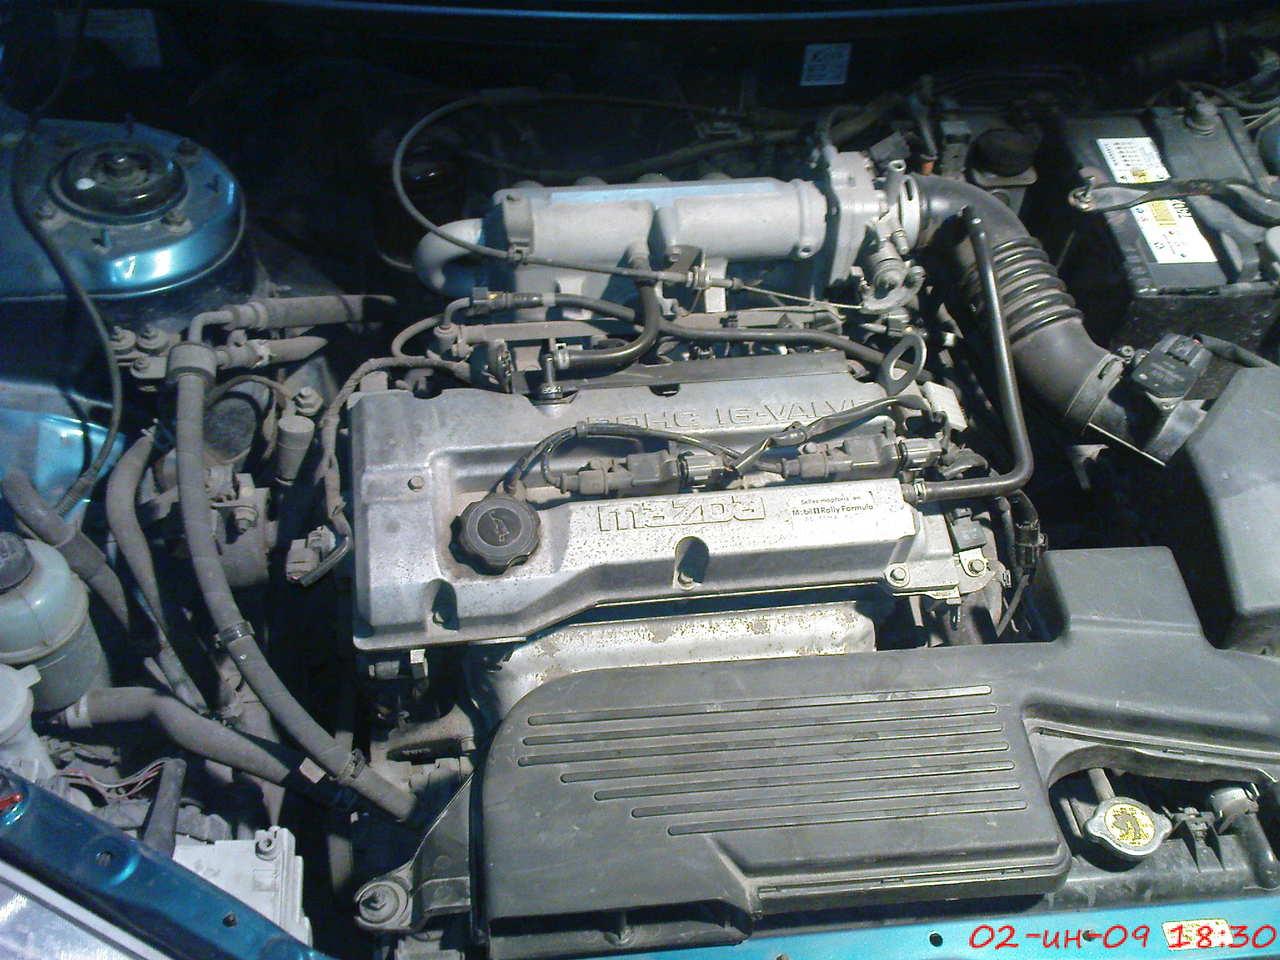 http://www.cars-directory.net/pics/mazda/323f/2000/mazda_323f_a1253443202b3040184_5_orig.jpg